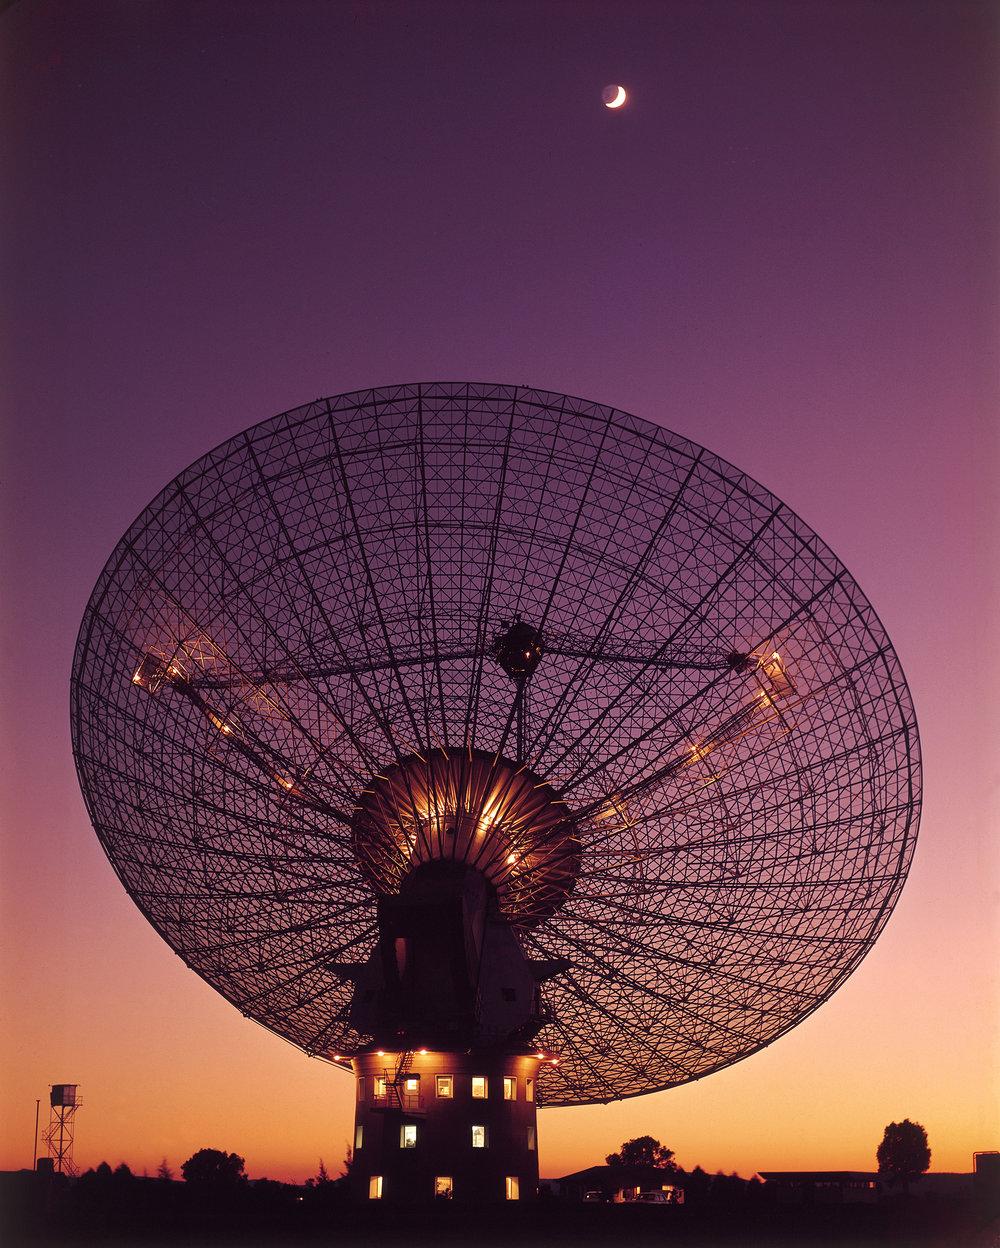 Image Credit:  WikimediaCommons/CSIRO